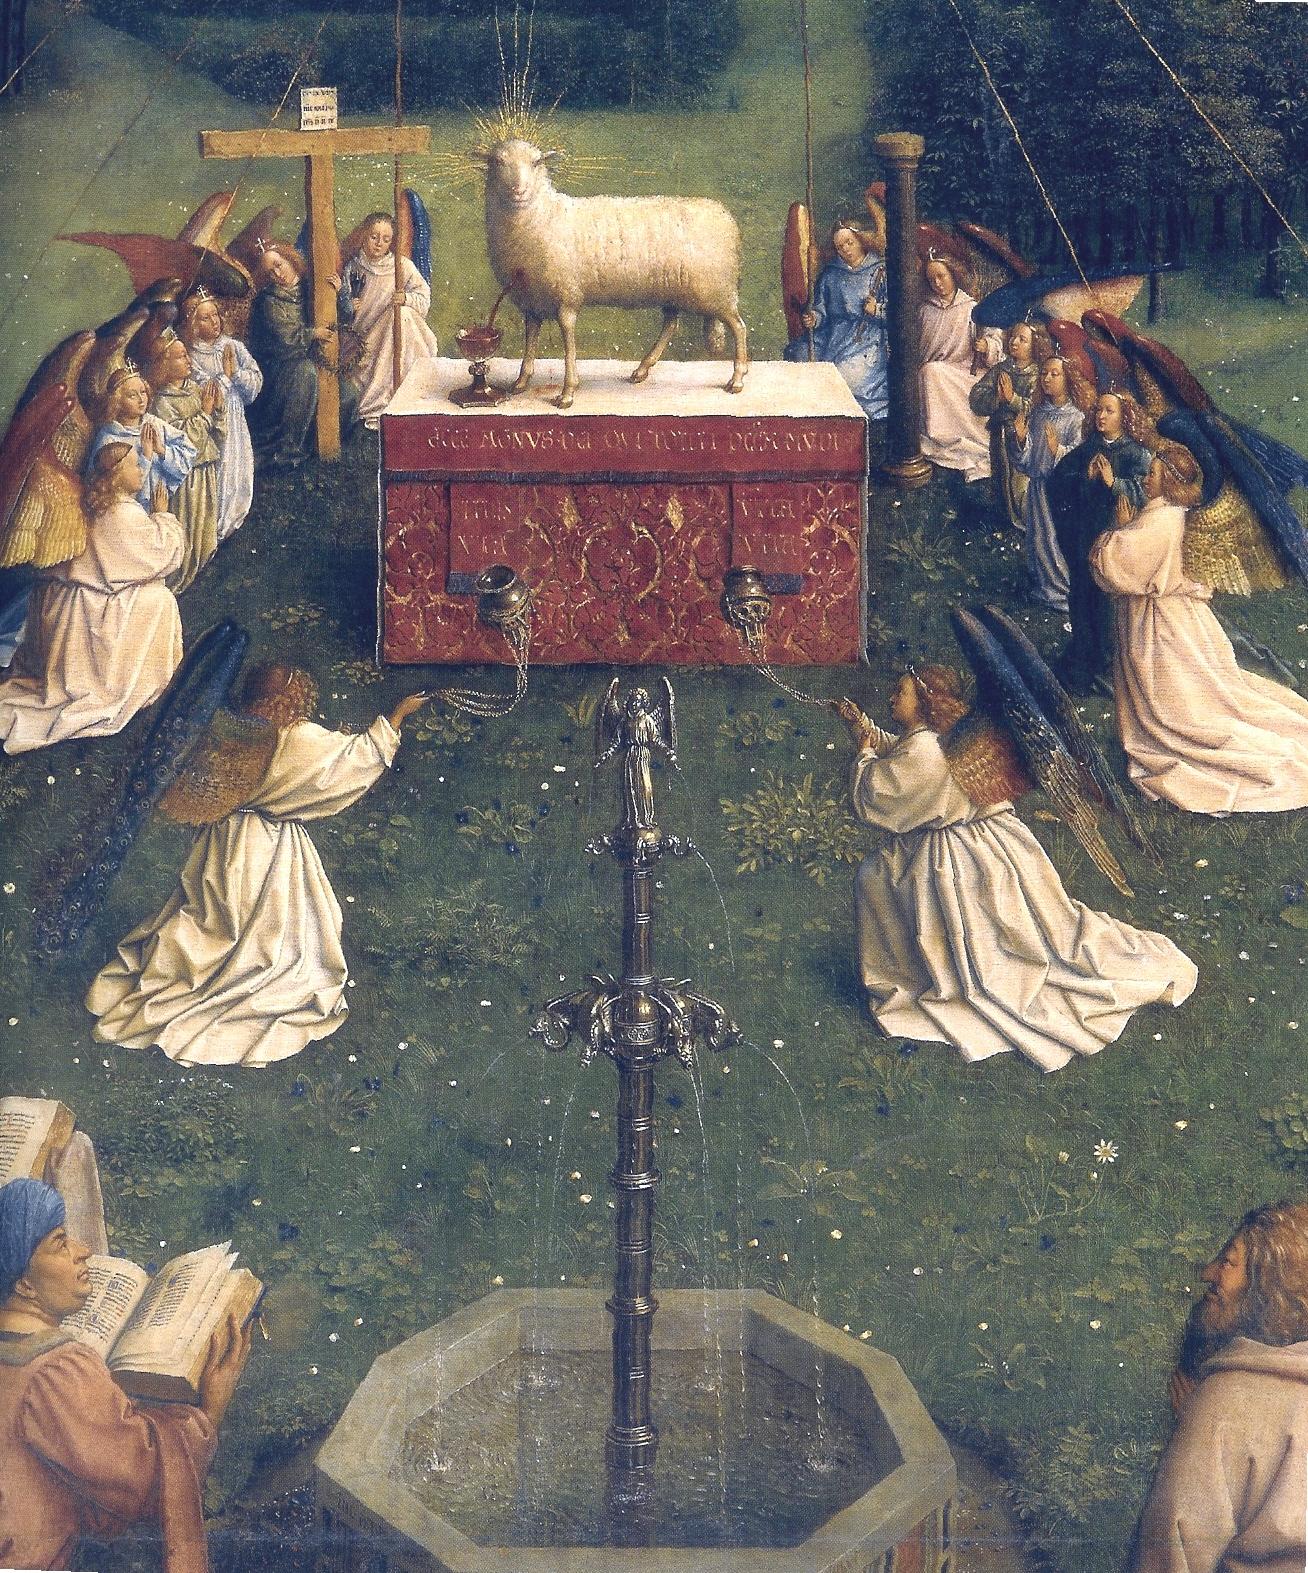 Ghent Altarpiece Lamb File:Ghent Altarpiece ...